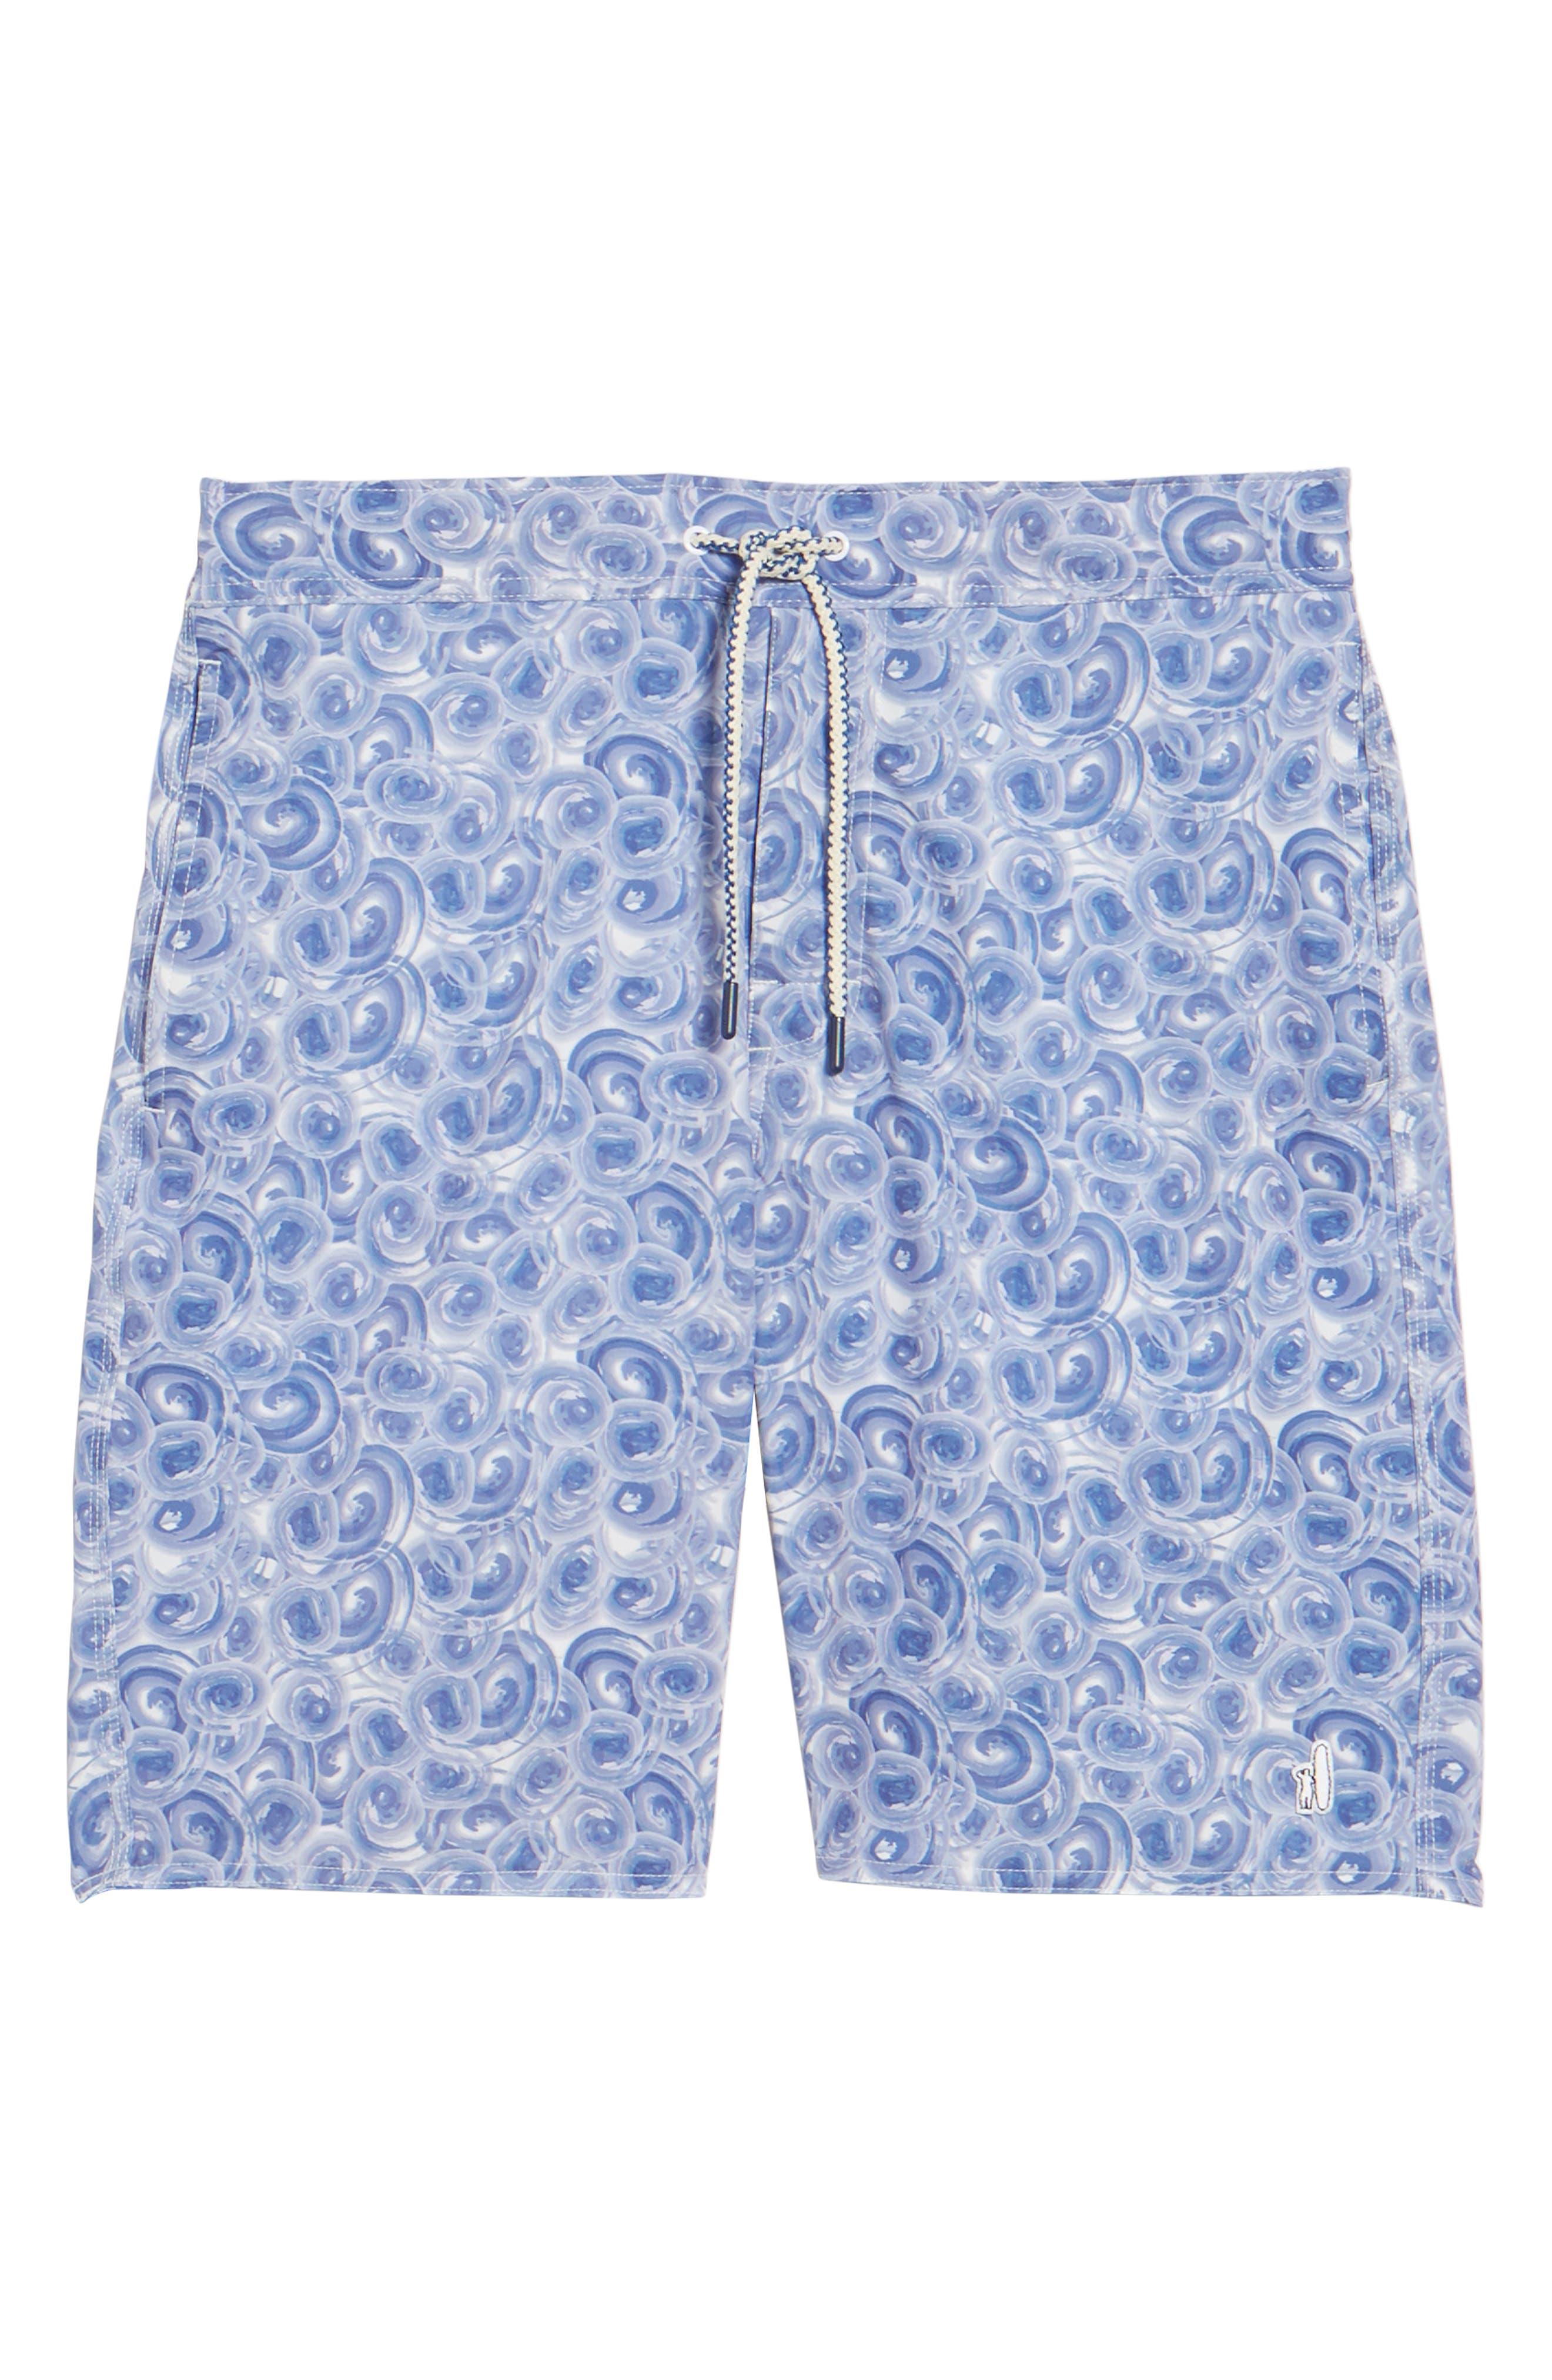 High Tide Regular Fit Board Shorts,                             Alternate thumbnail 6, color,                             400